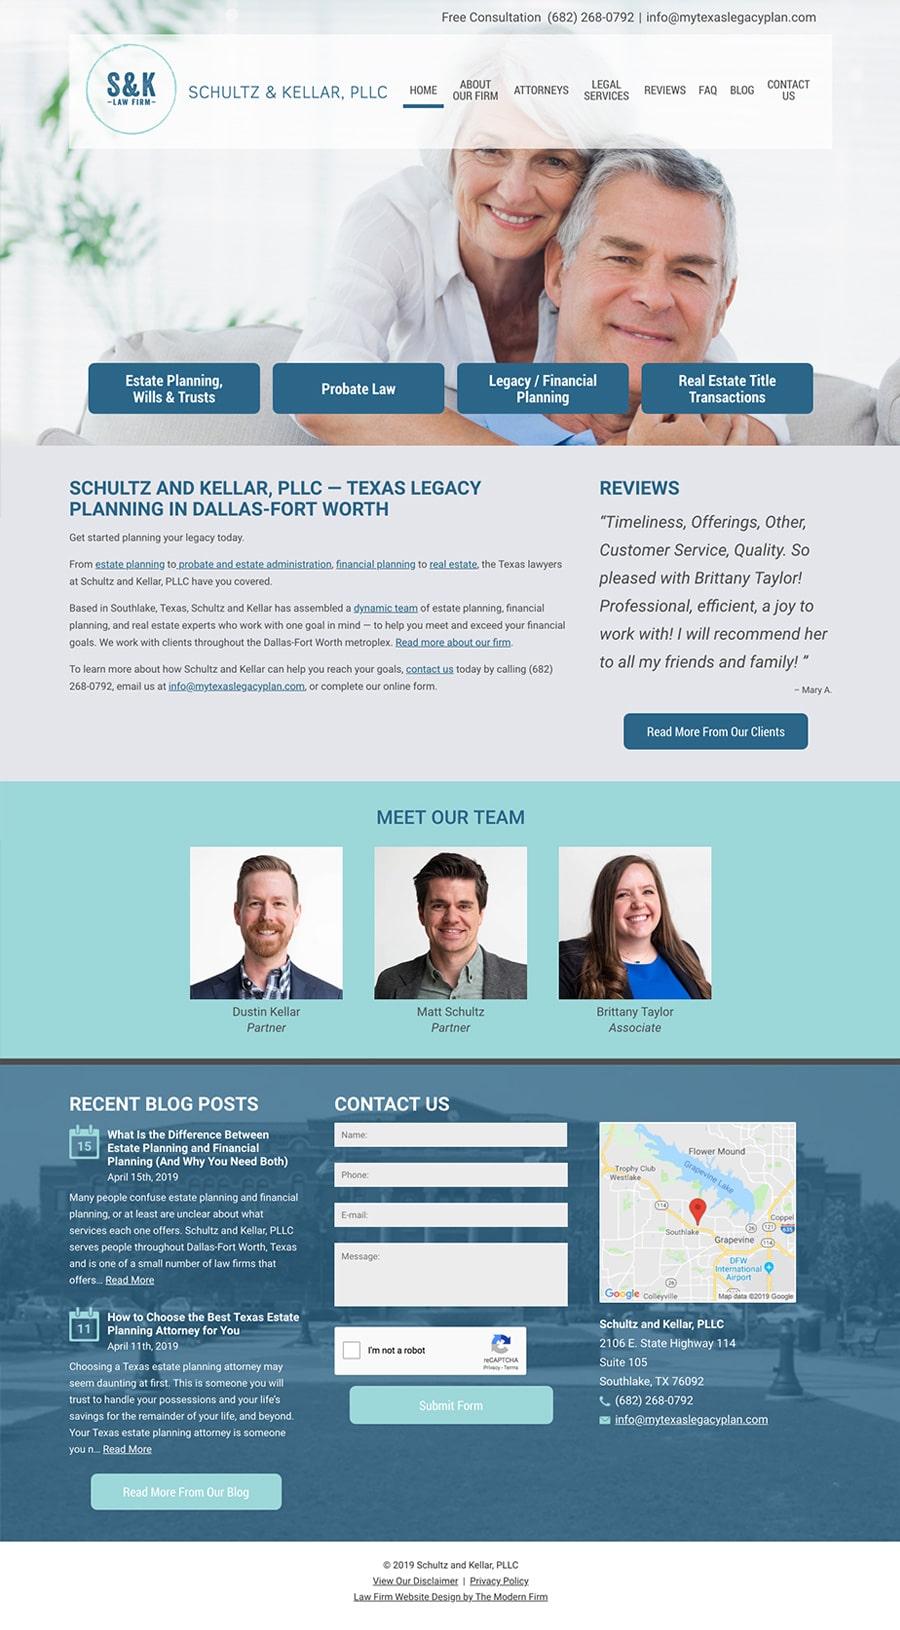 Law Firm Website Design for Schultz and Kellar, PLLC